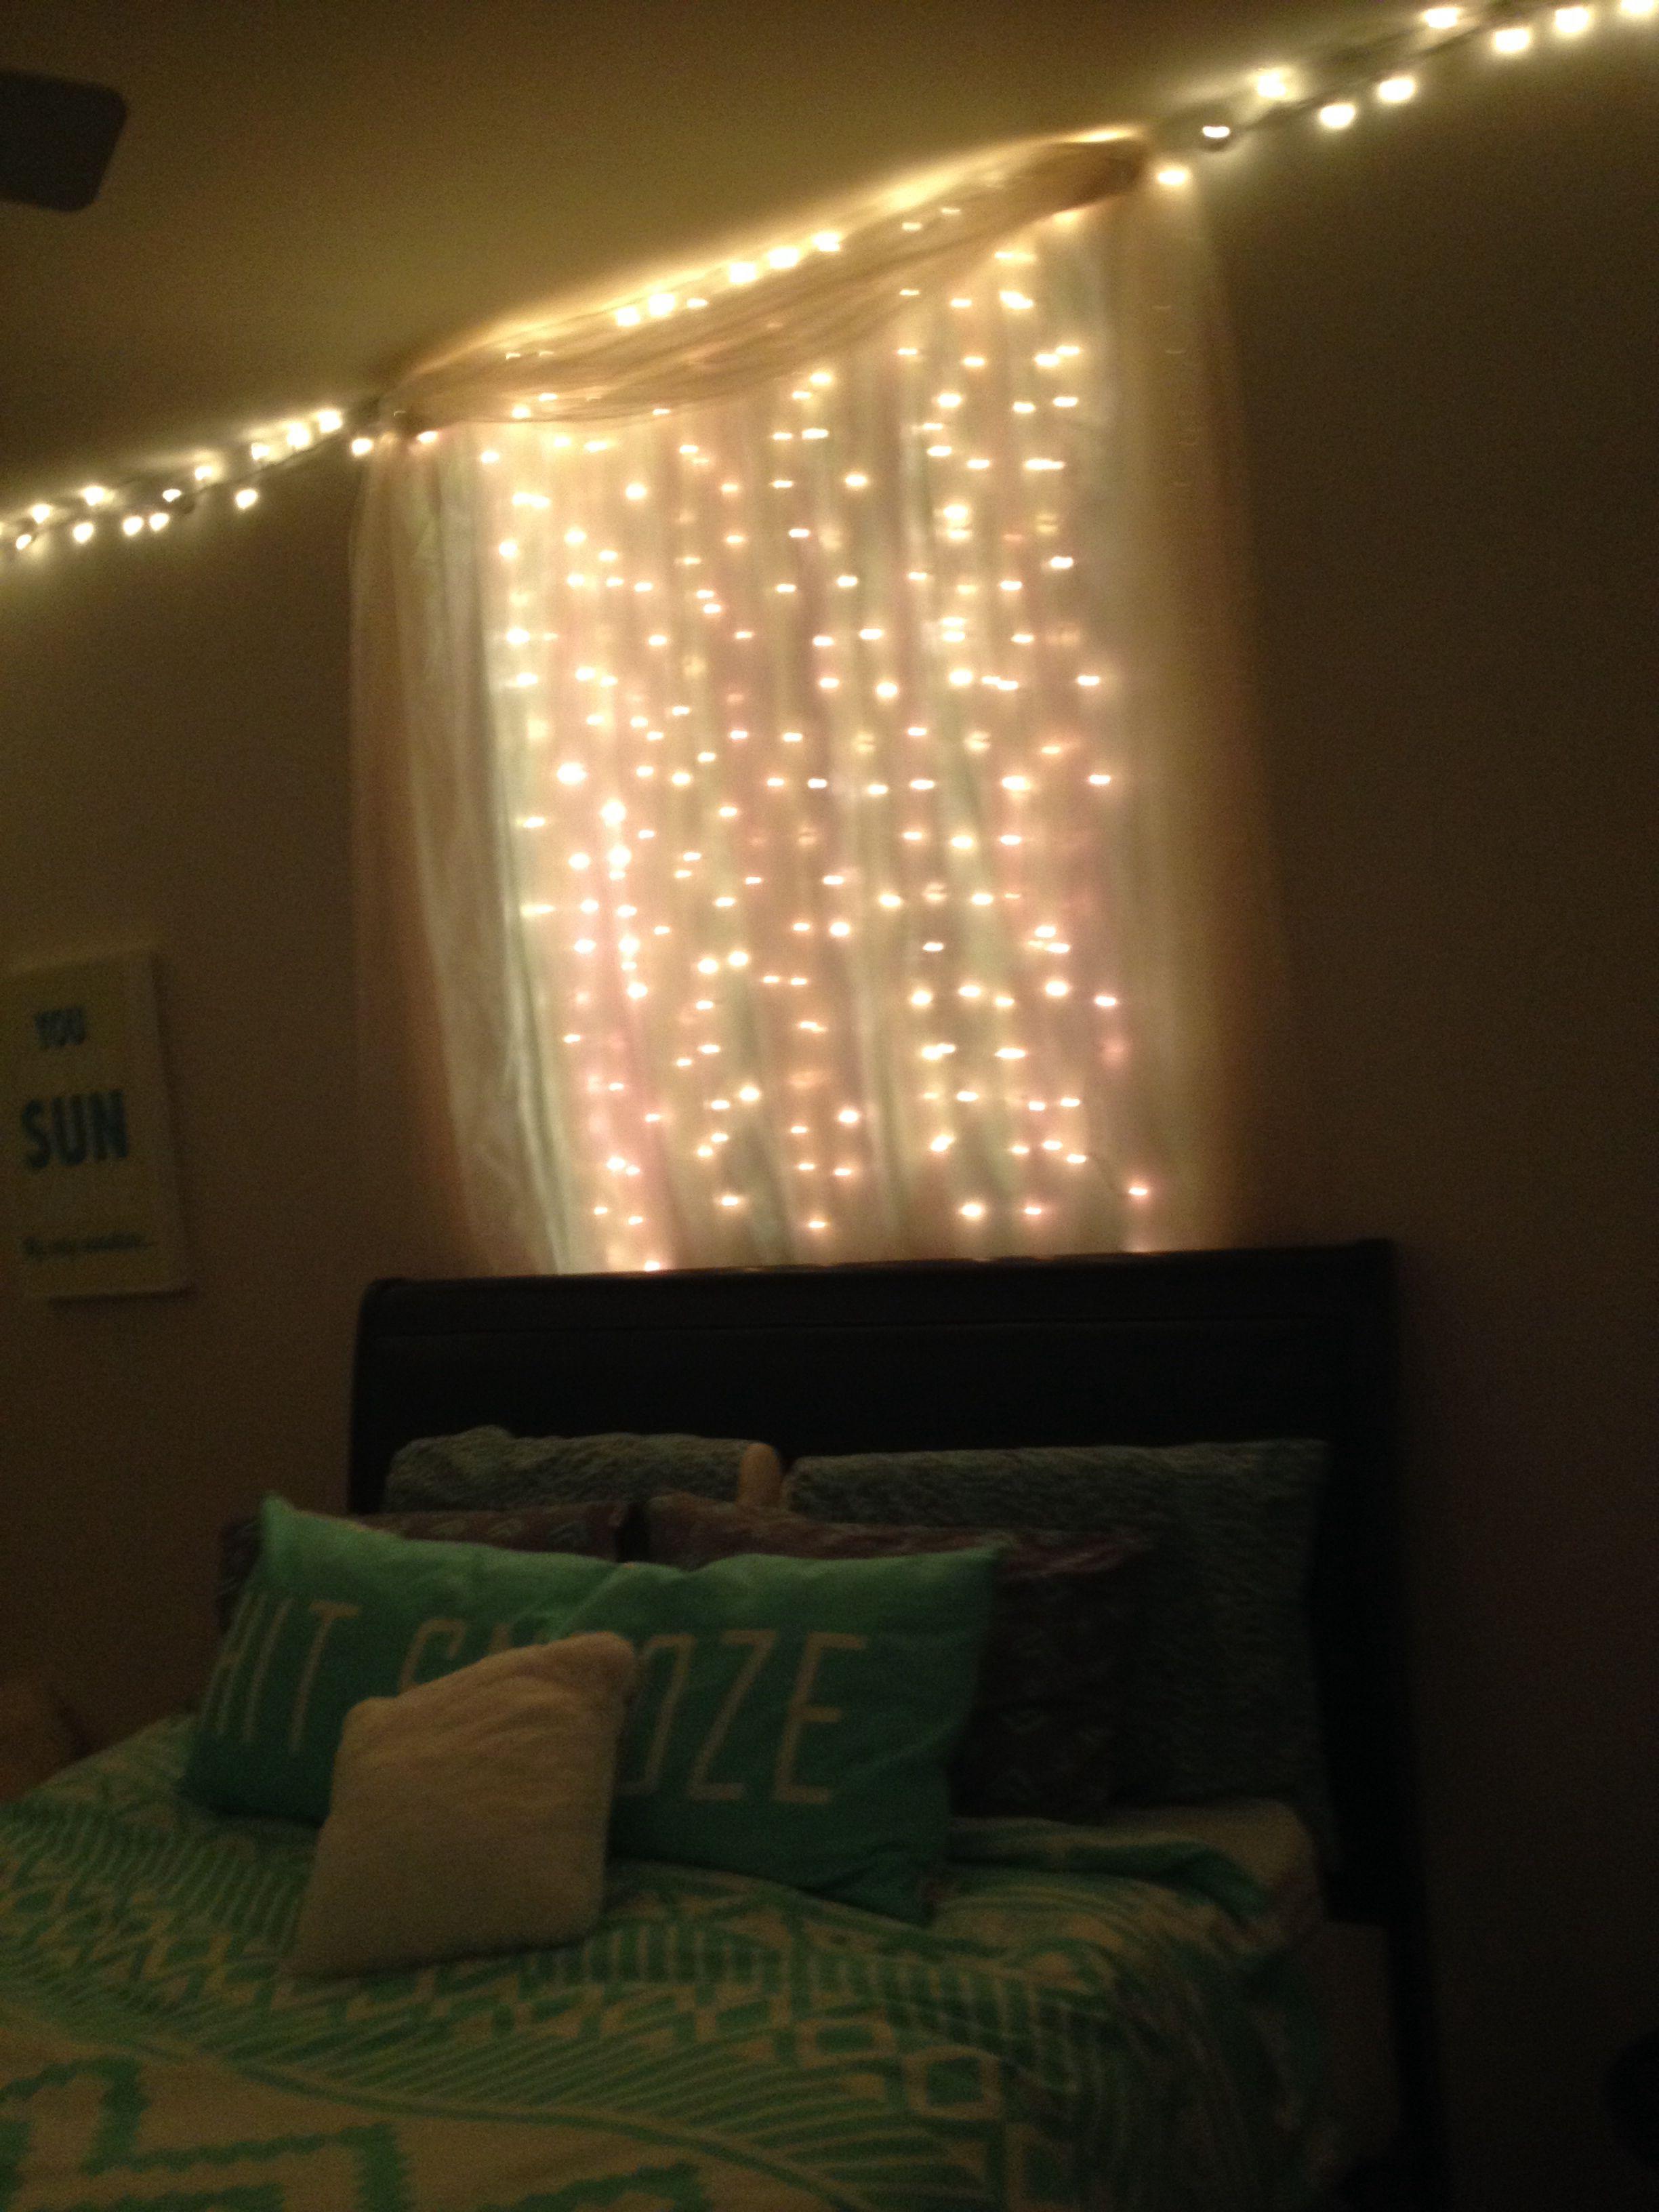 #Lights Bedroom Lights, Maybe Dorm Room Super Easy String Lights,